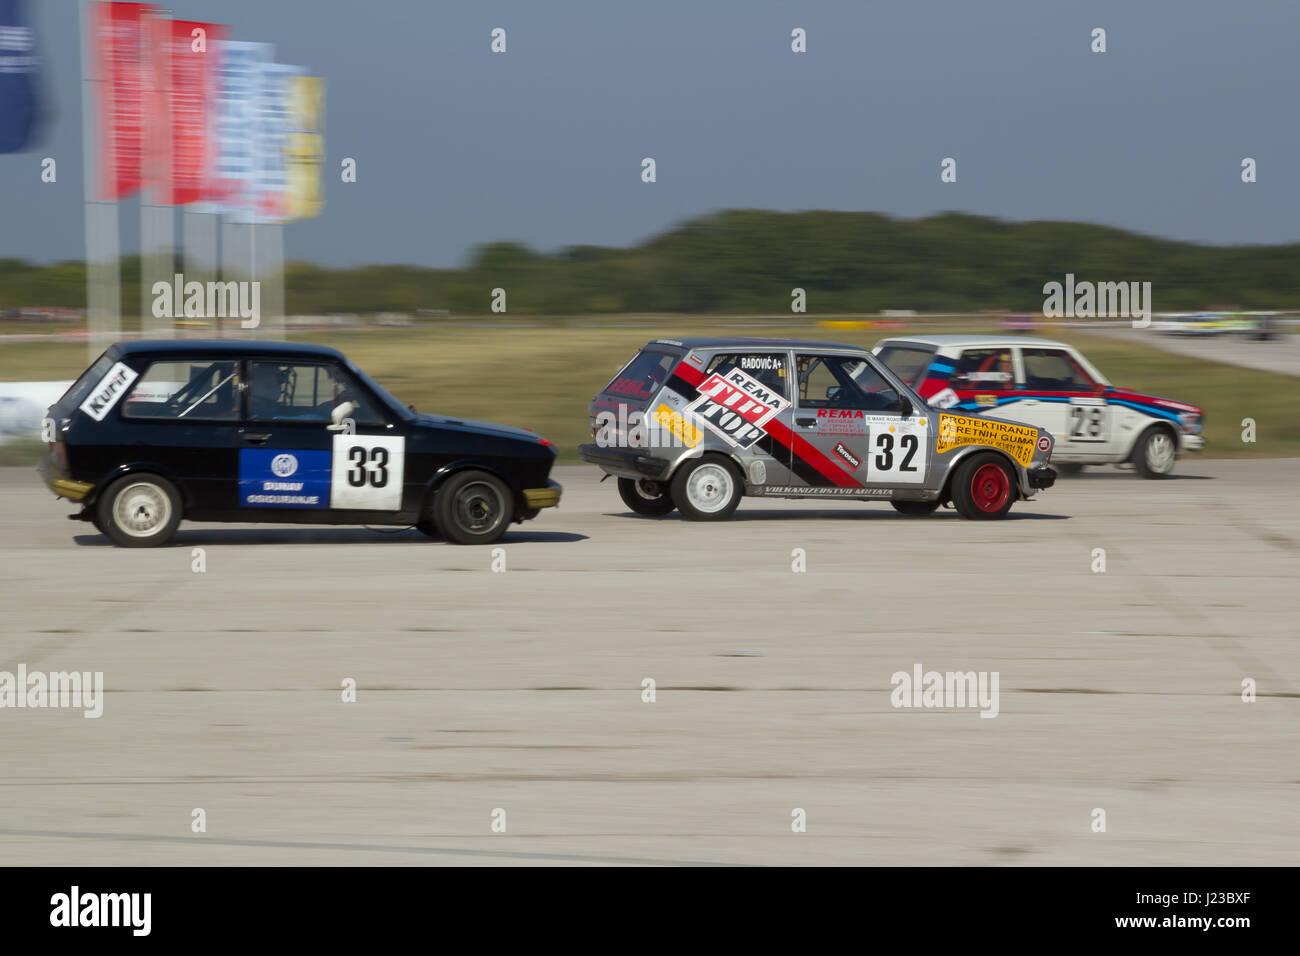 "Belgrad, Serbien, 24. September 2011: Car racing Meisterschaft ""EKO Nagrada 2011"", drei Jugo 55 Autos Stockbild"